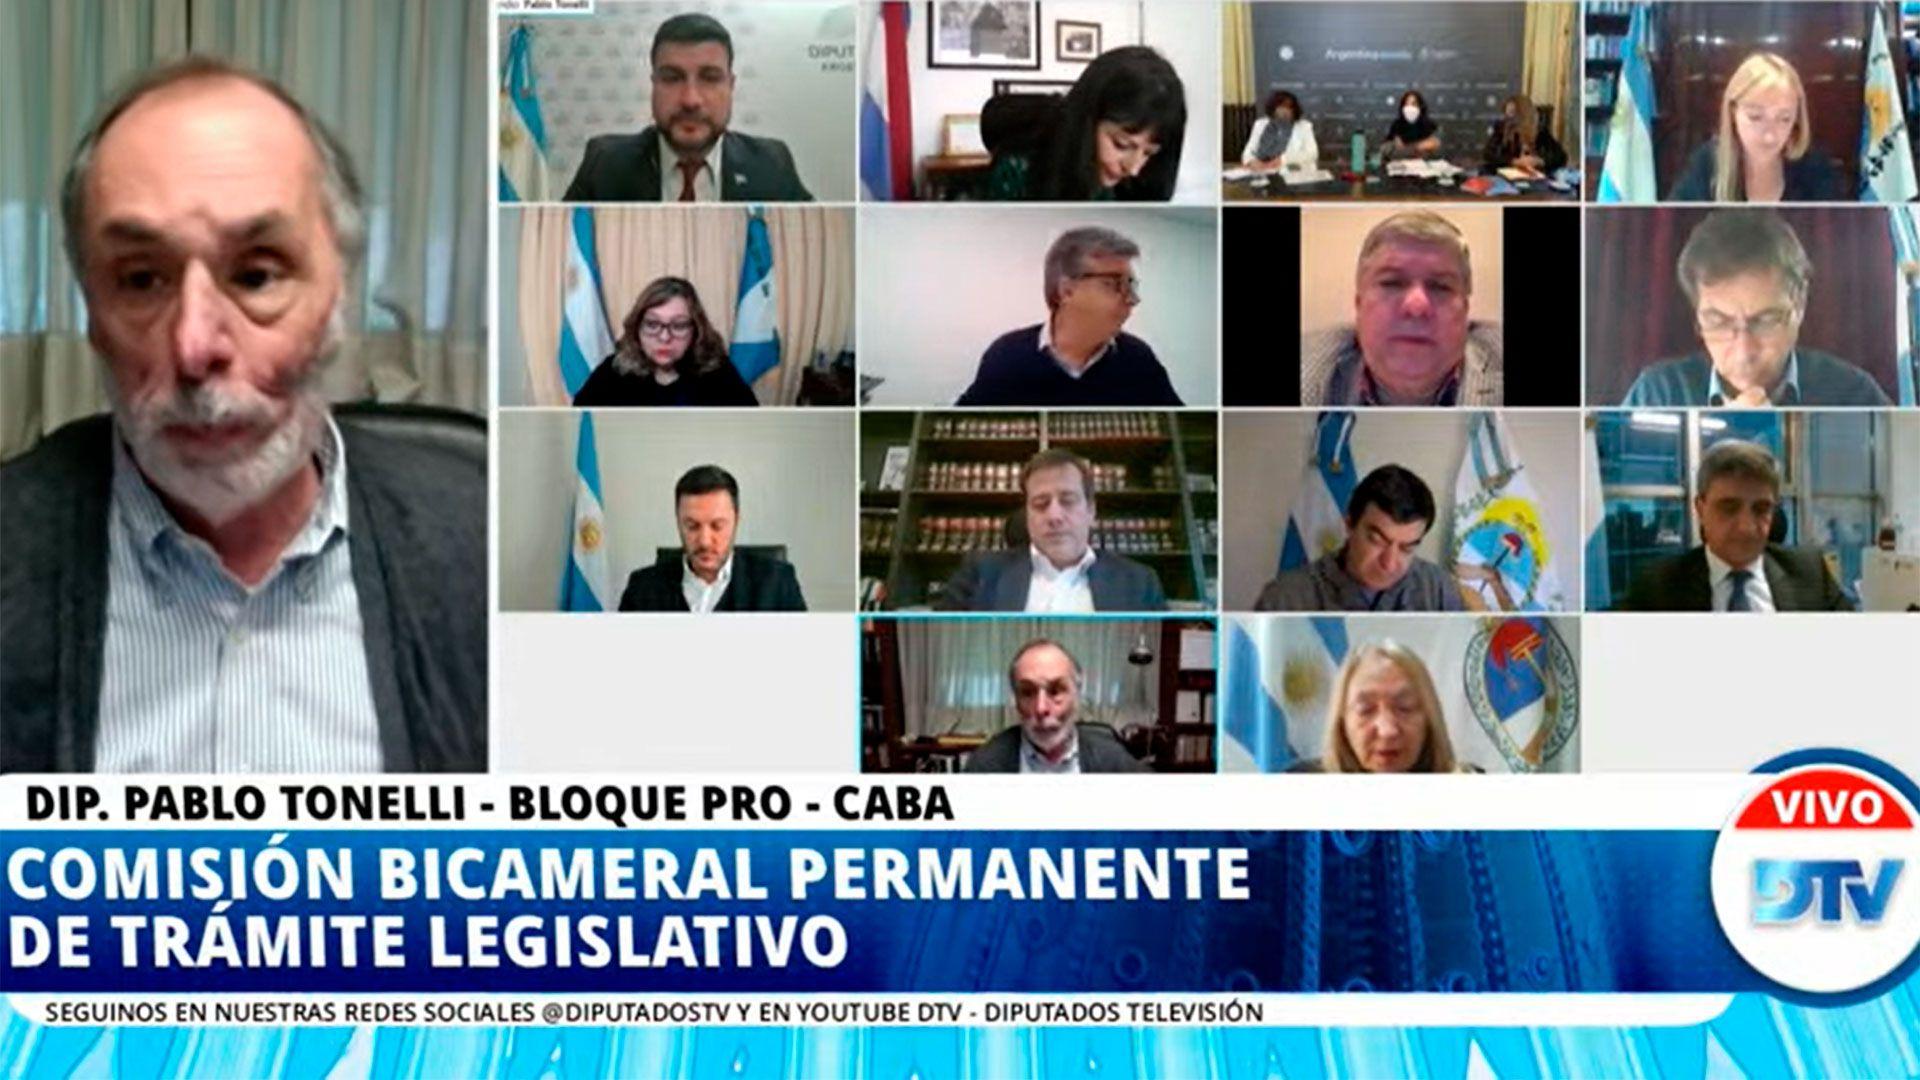 Decreto de Vacunas Cecilia Nicolini, Clara Vizzotti, Vilma Ibarra Pablo Tonelli  vilma ibarra